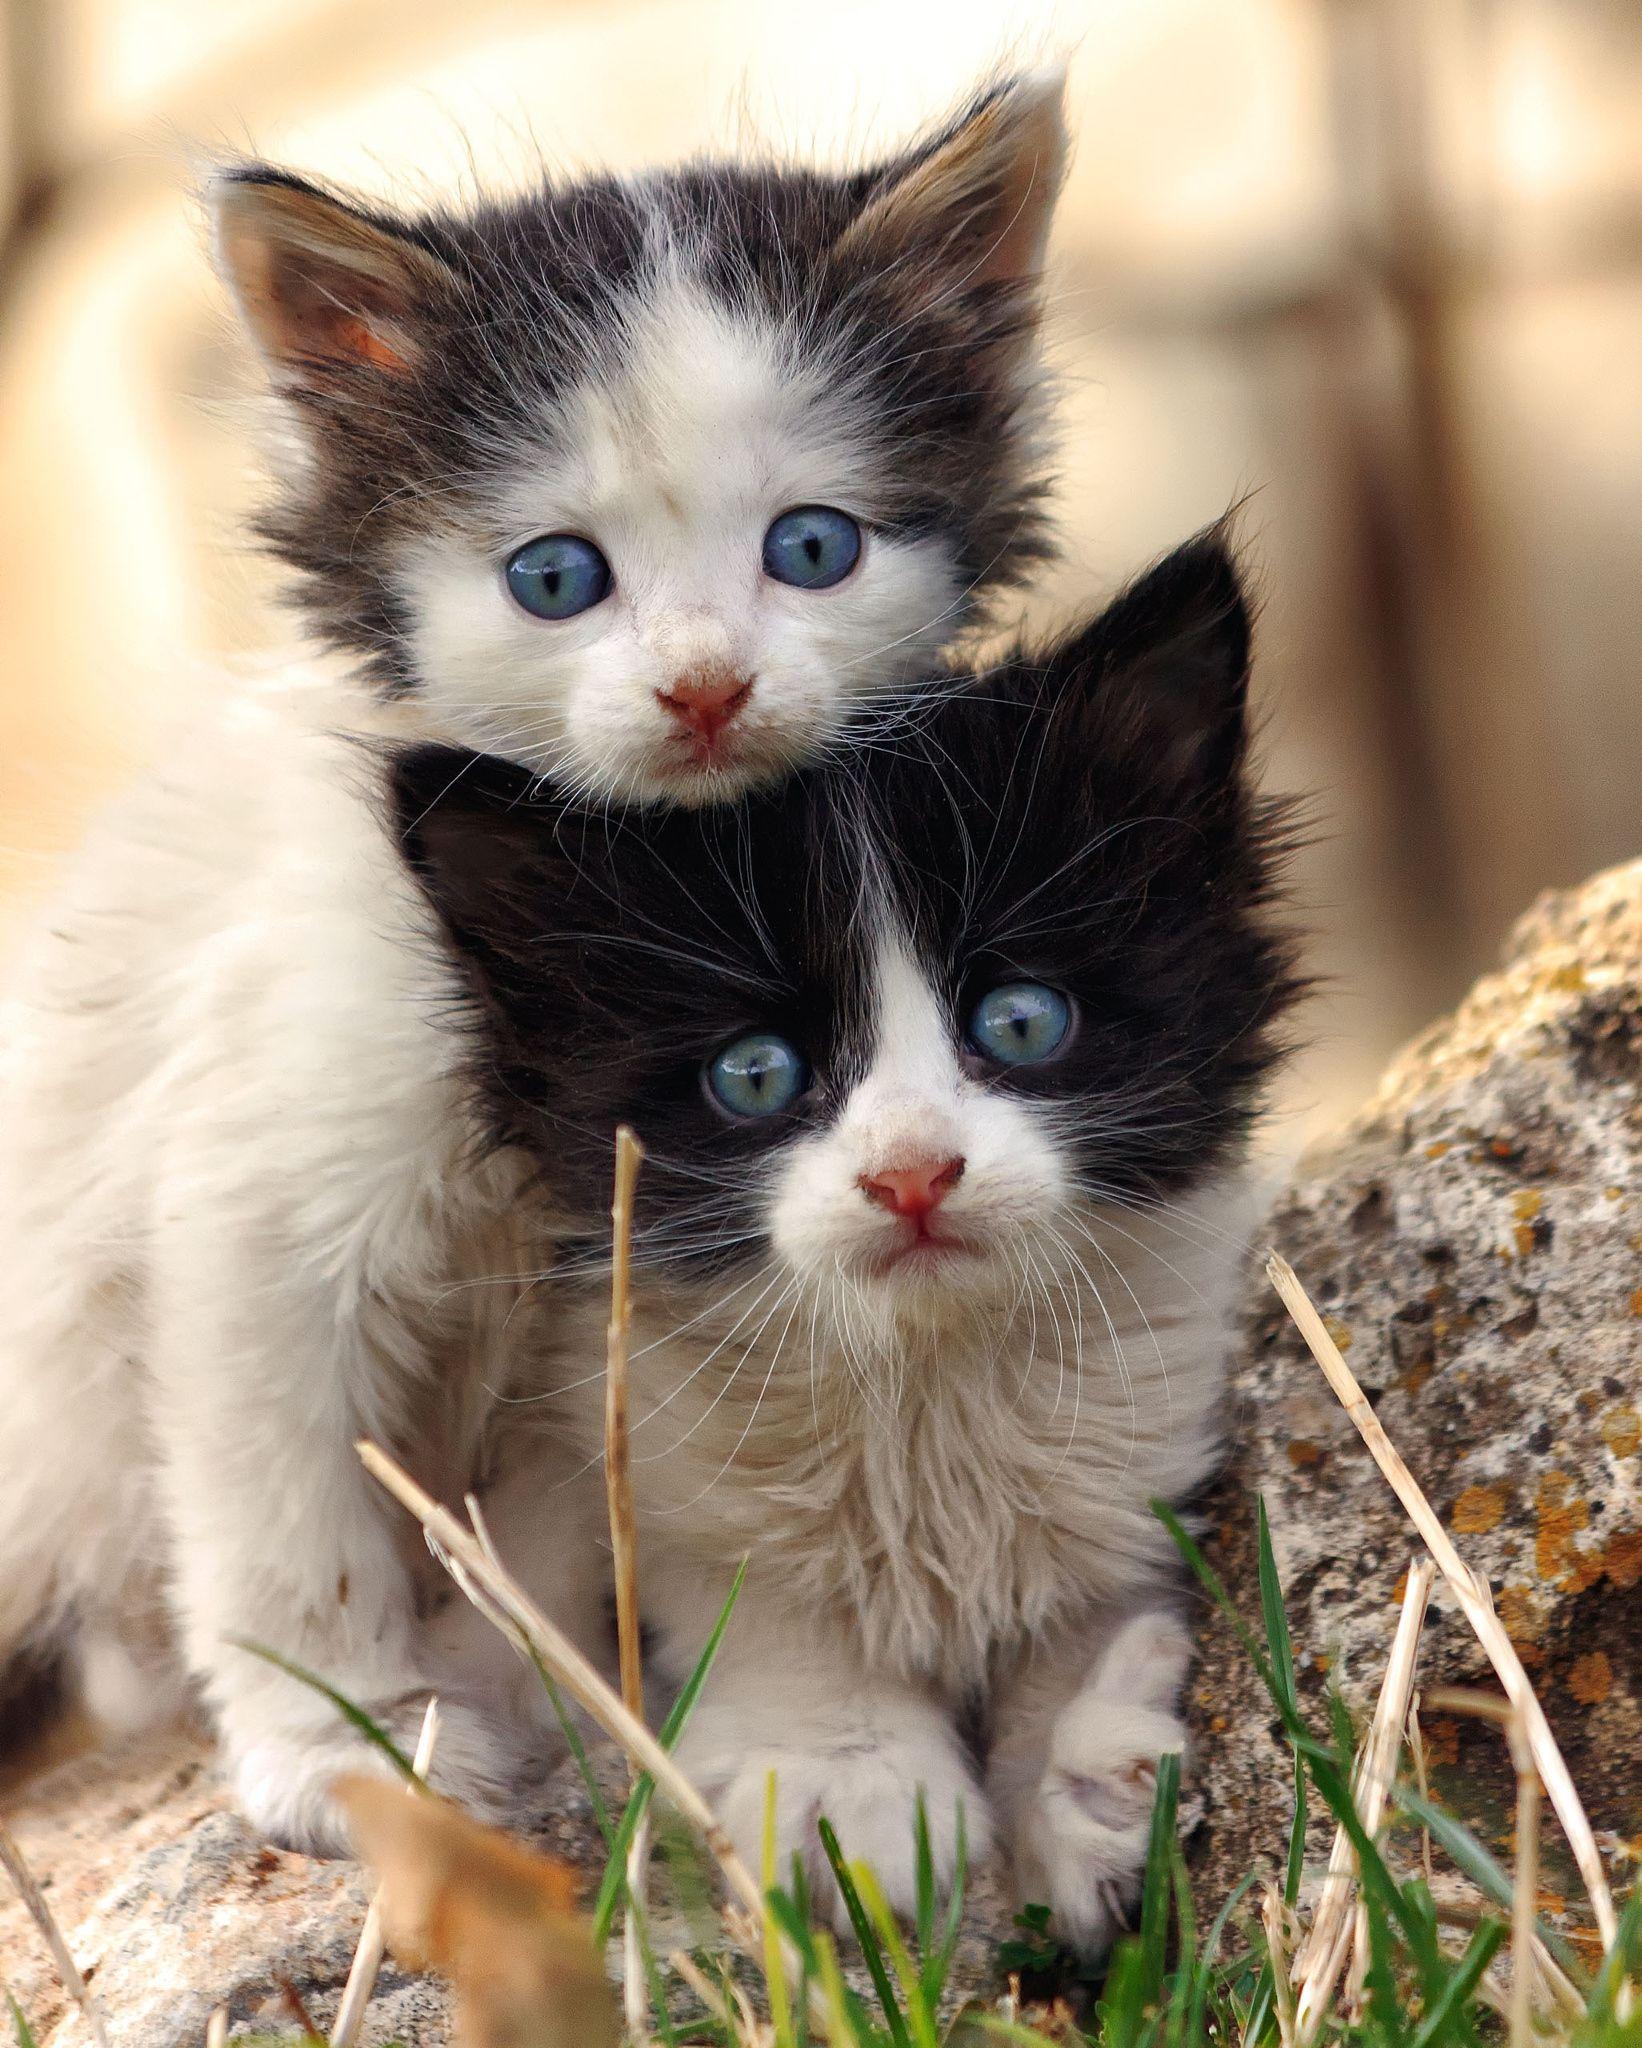 Two Kittens Cat Kitty Cute Kittens Cutest Cute Animals Cute Cats